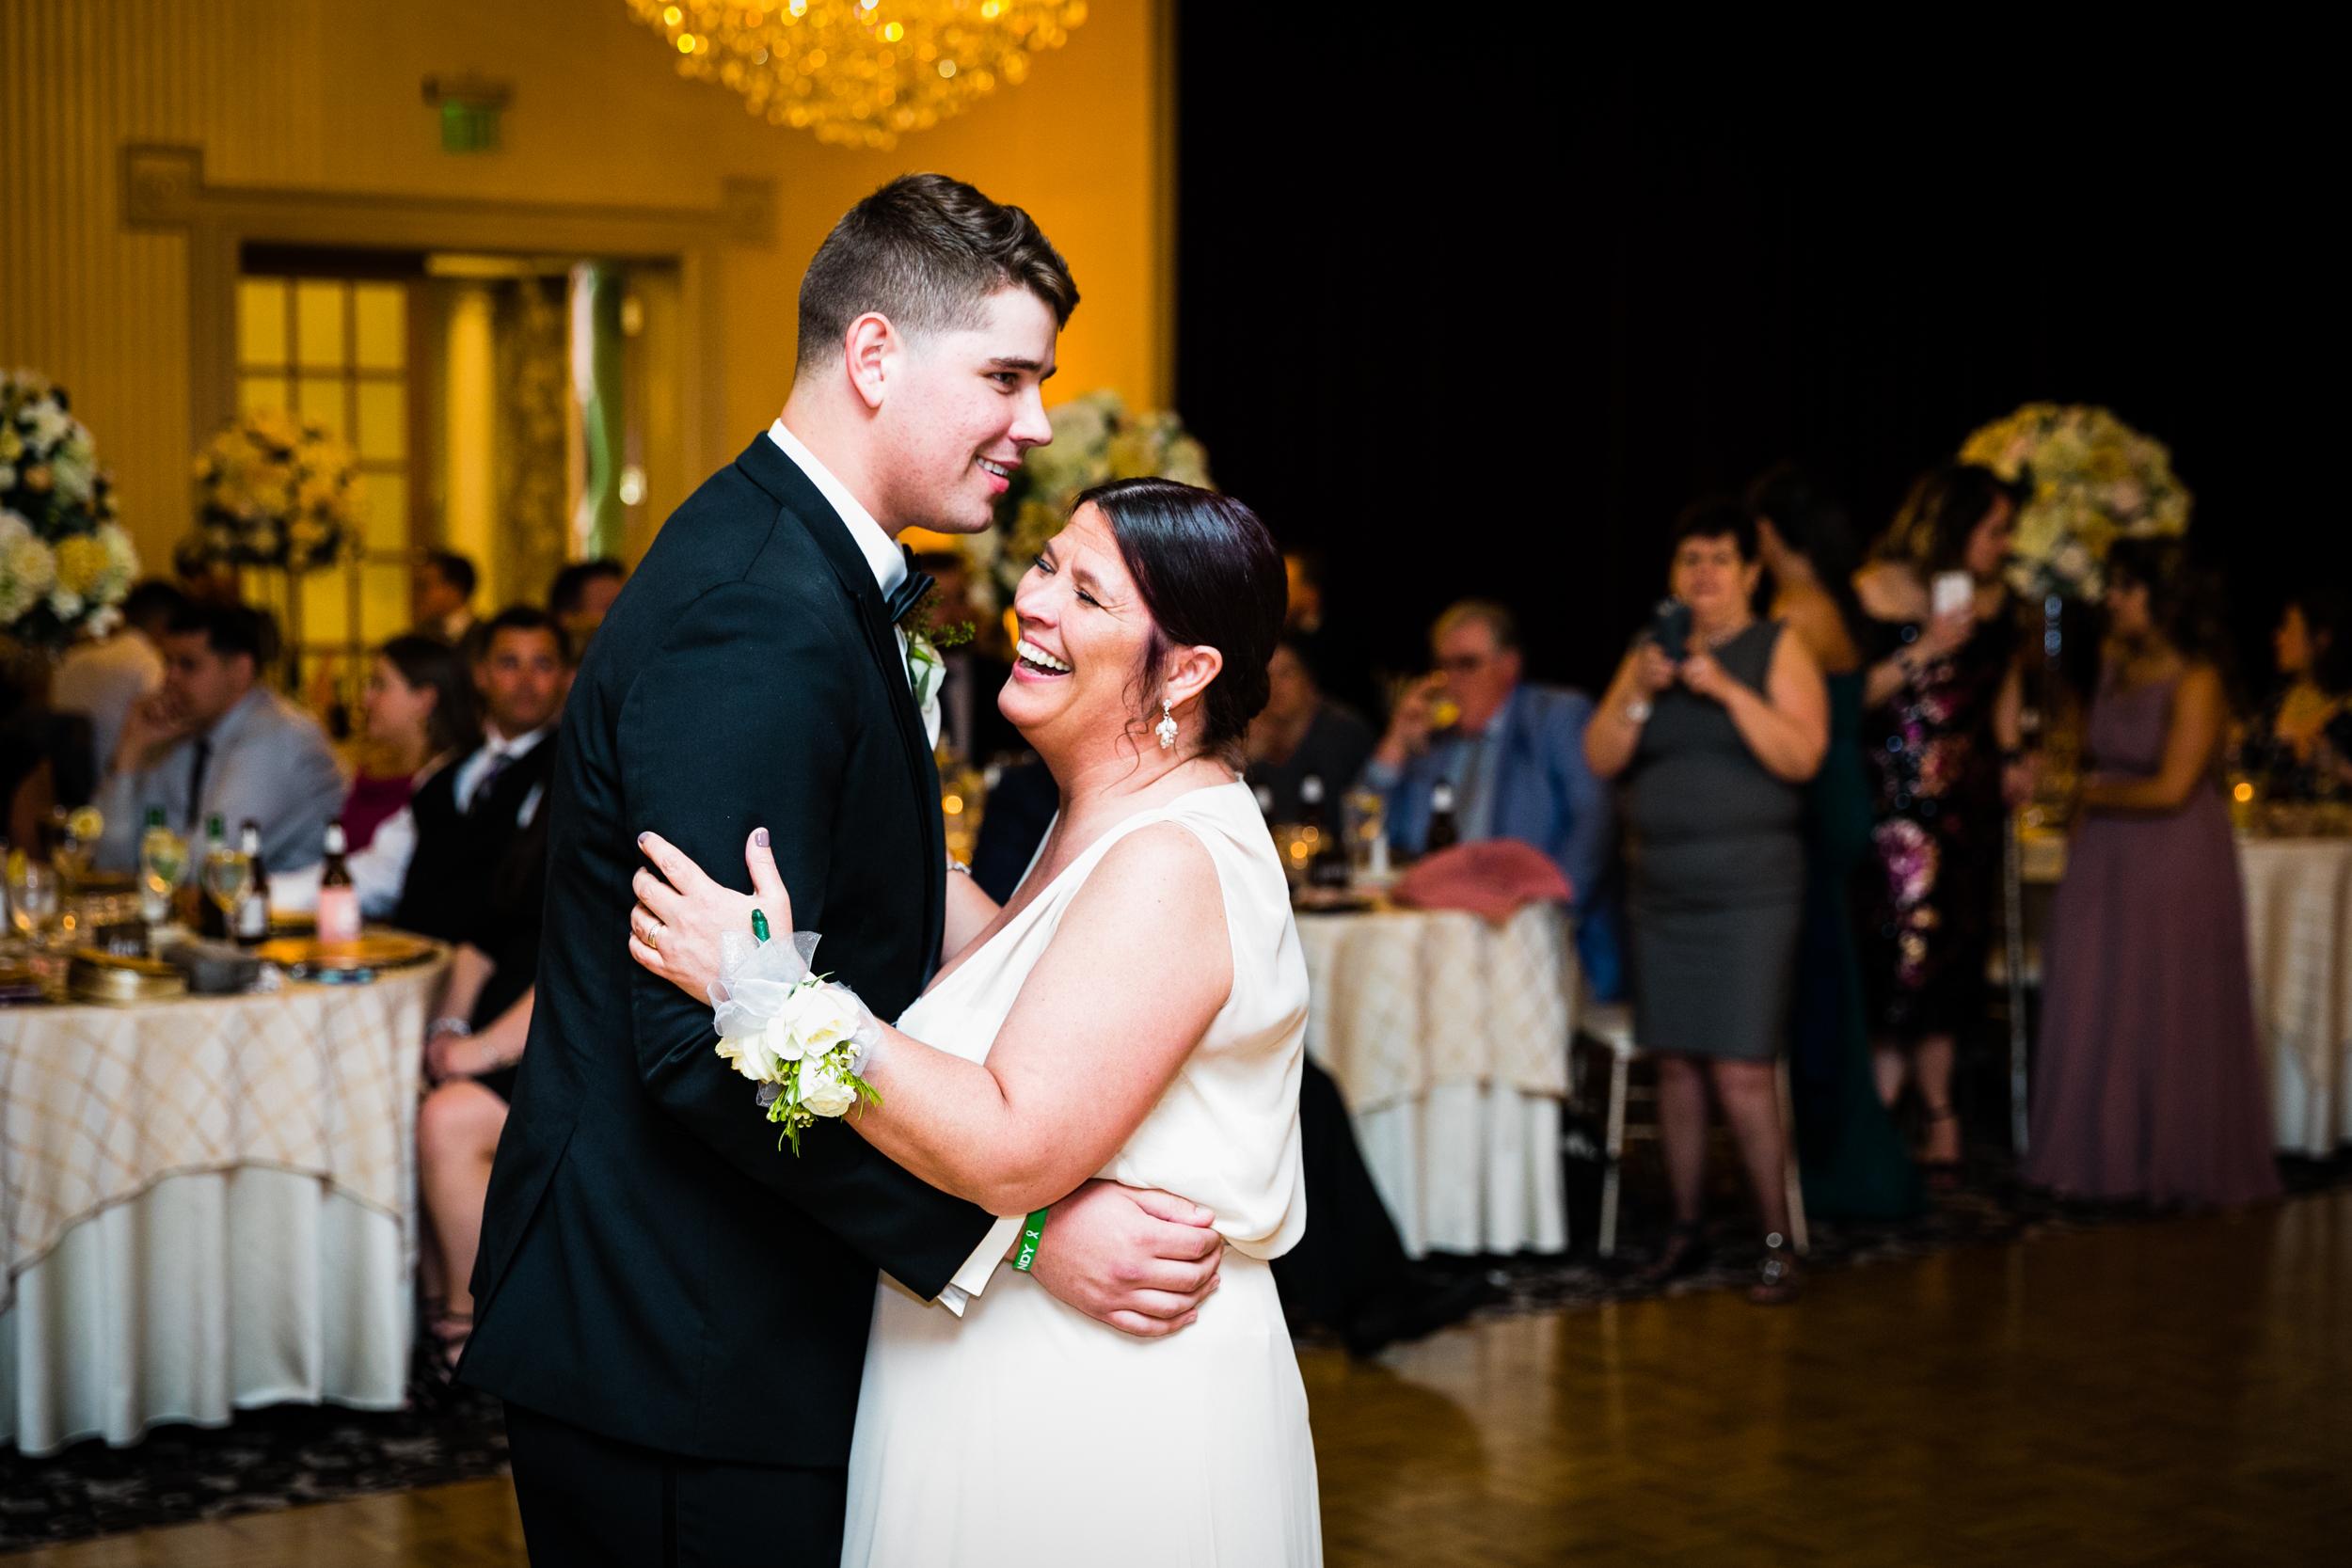 CELEBRATIONS BENSALEM WEDDING PHOTOGRAPHY-93.jpg